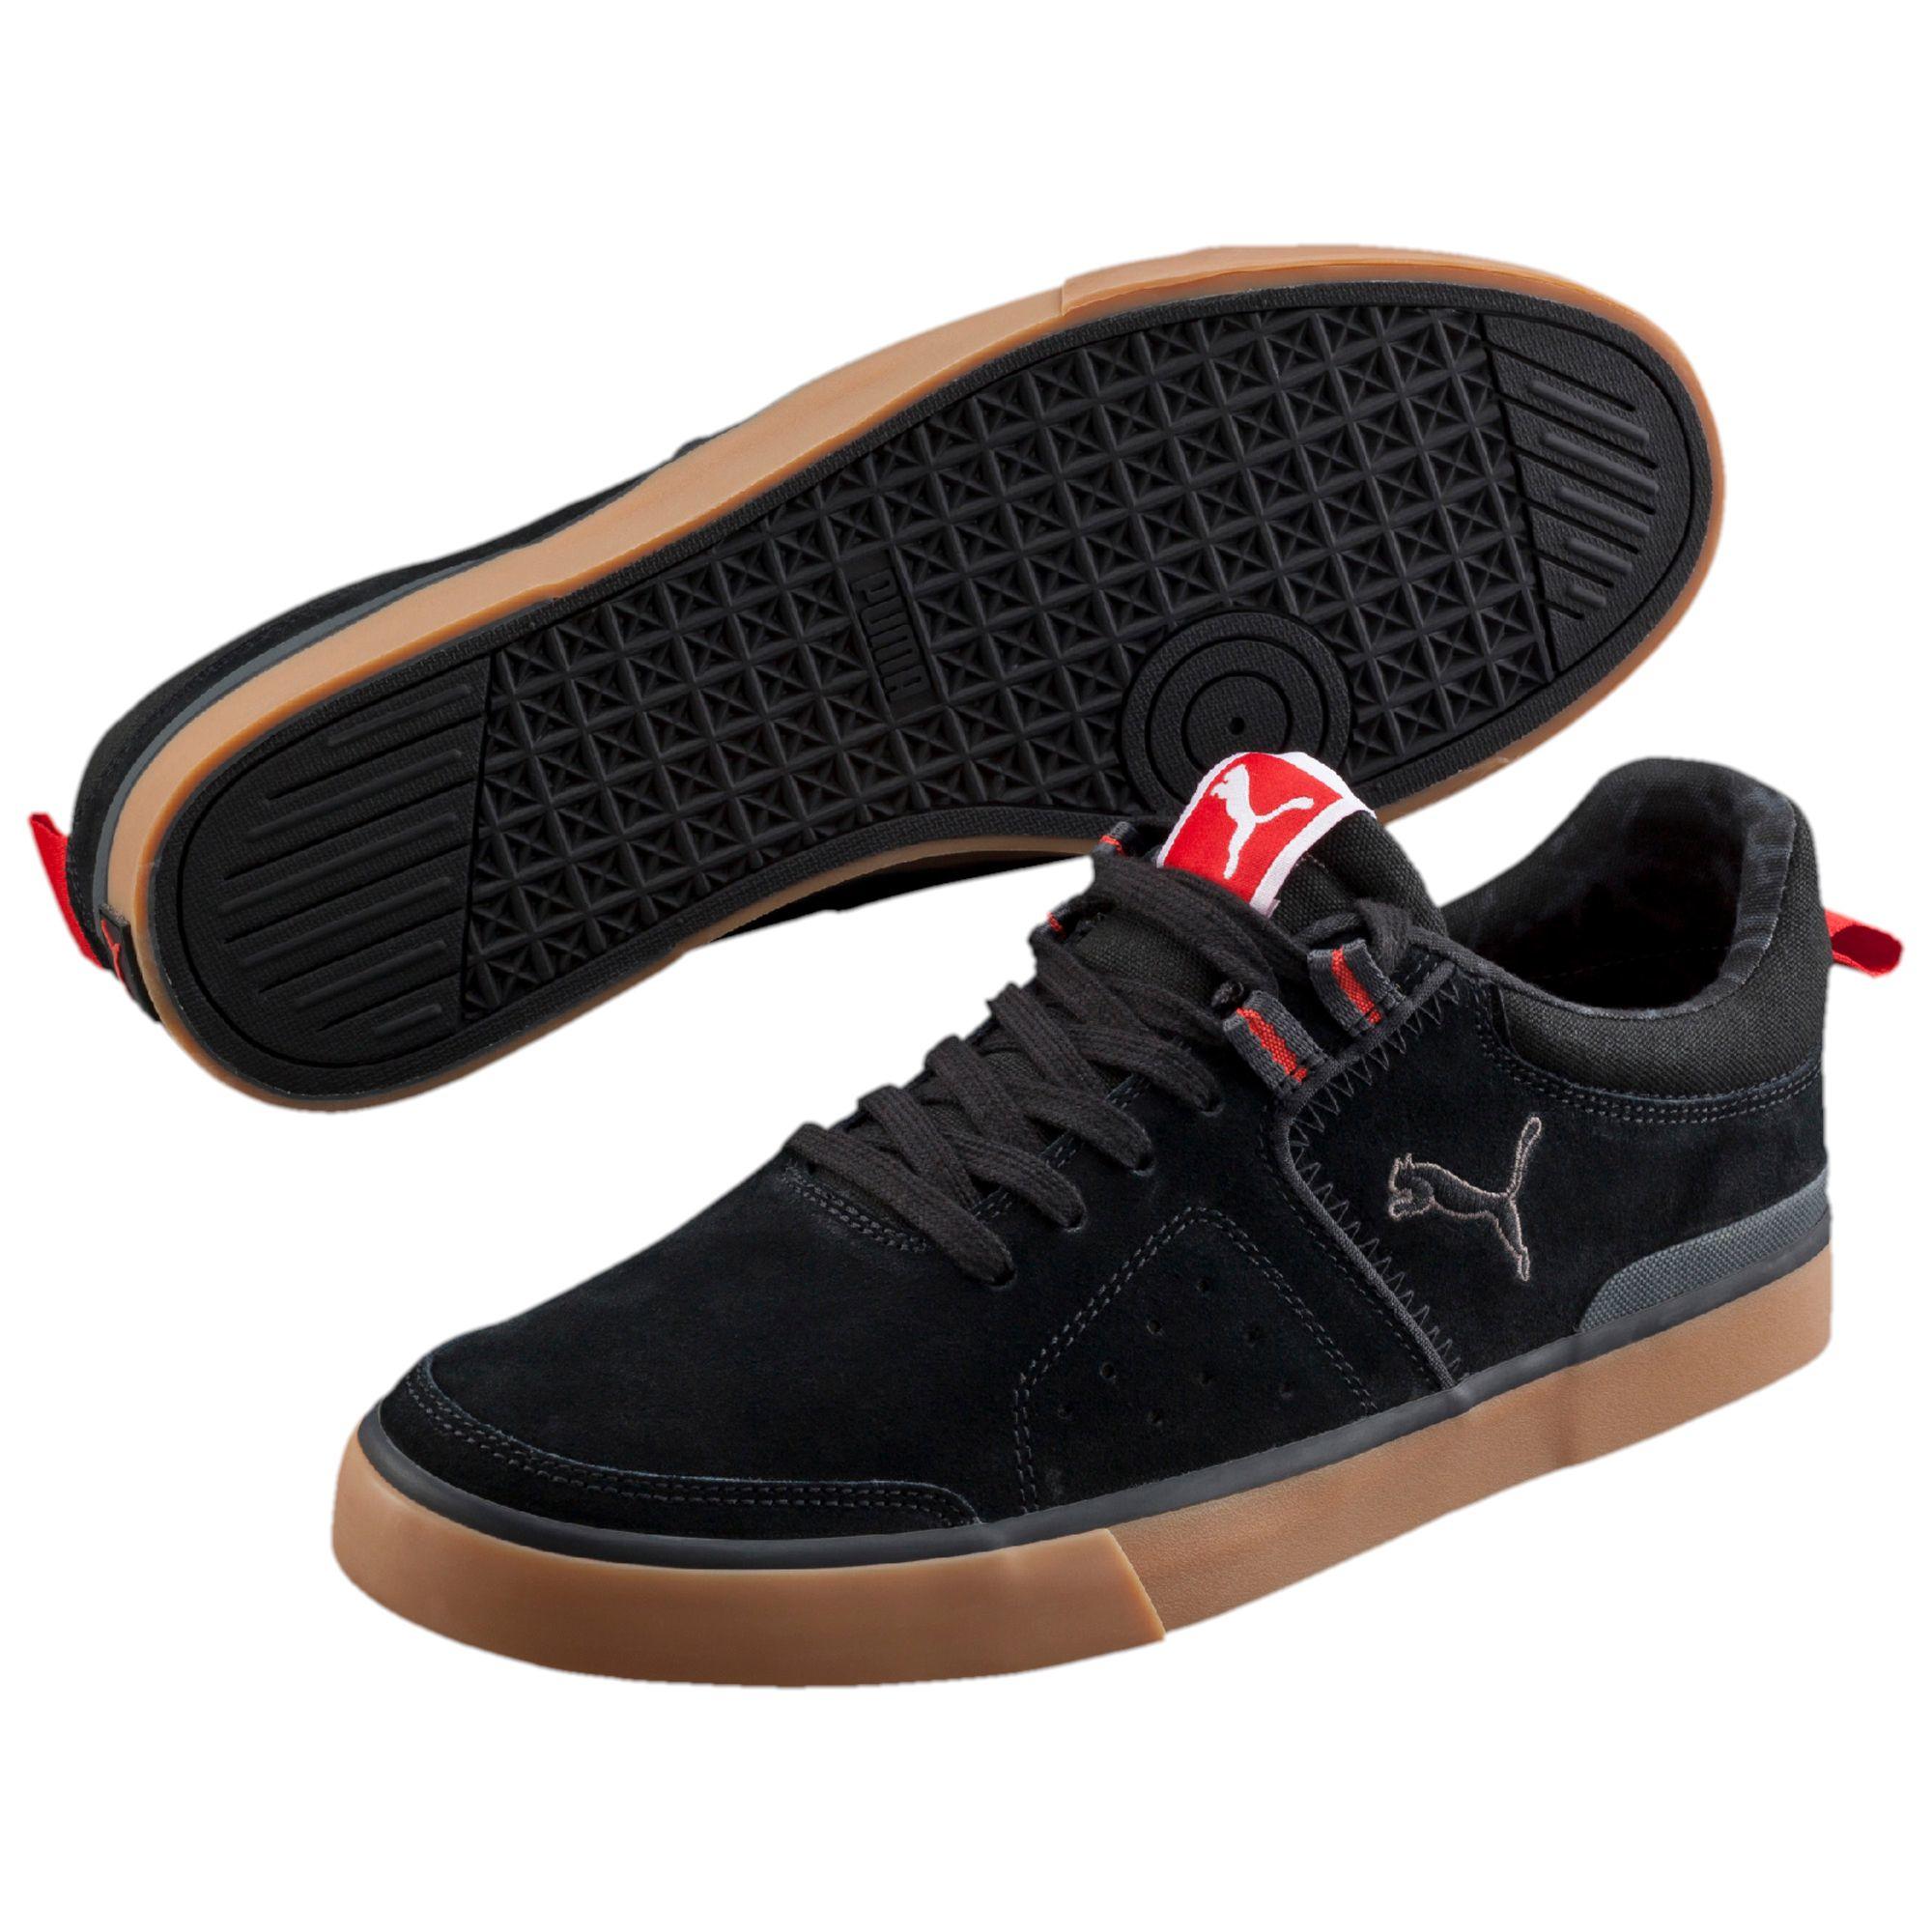 c6400f3f1f1b Lyst - PUMA Funist Slider Vulc Men s Shoes in Black for Men